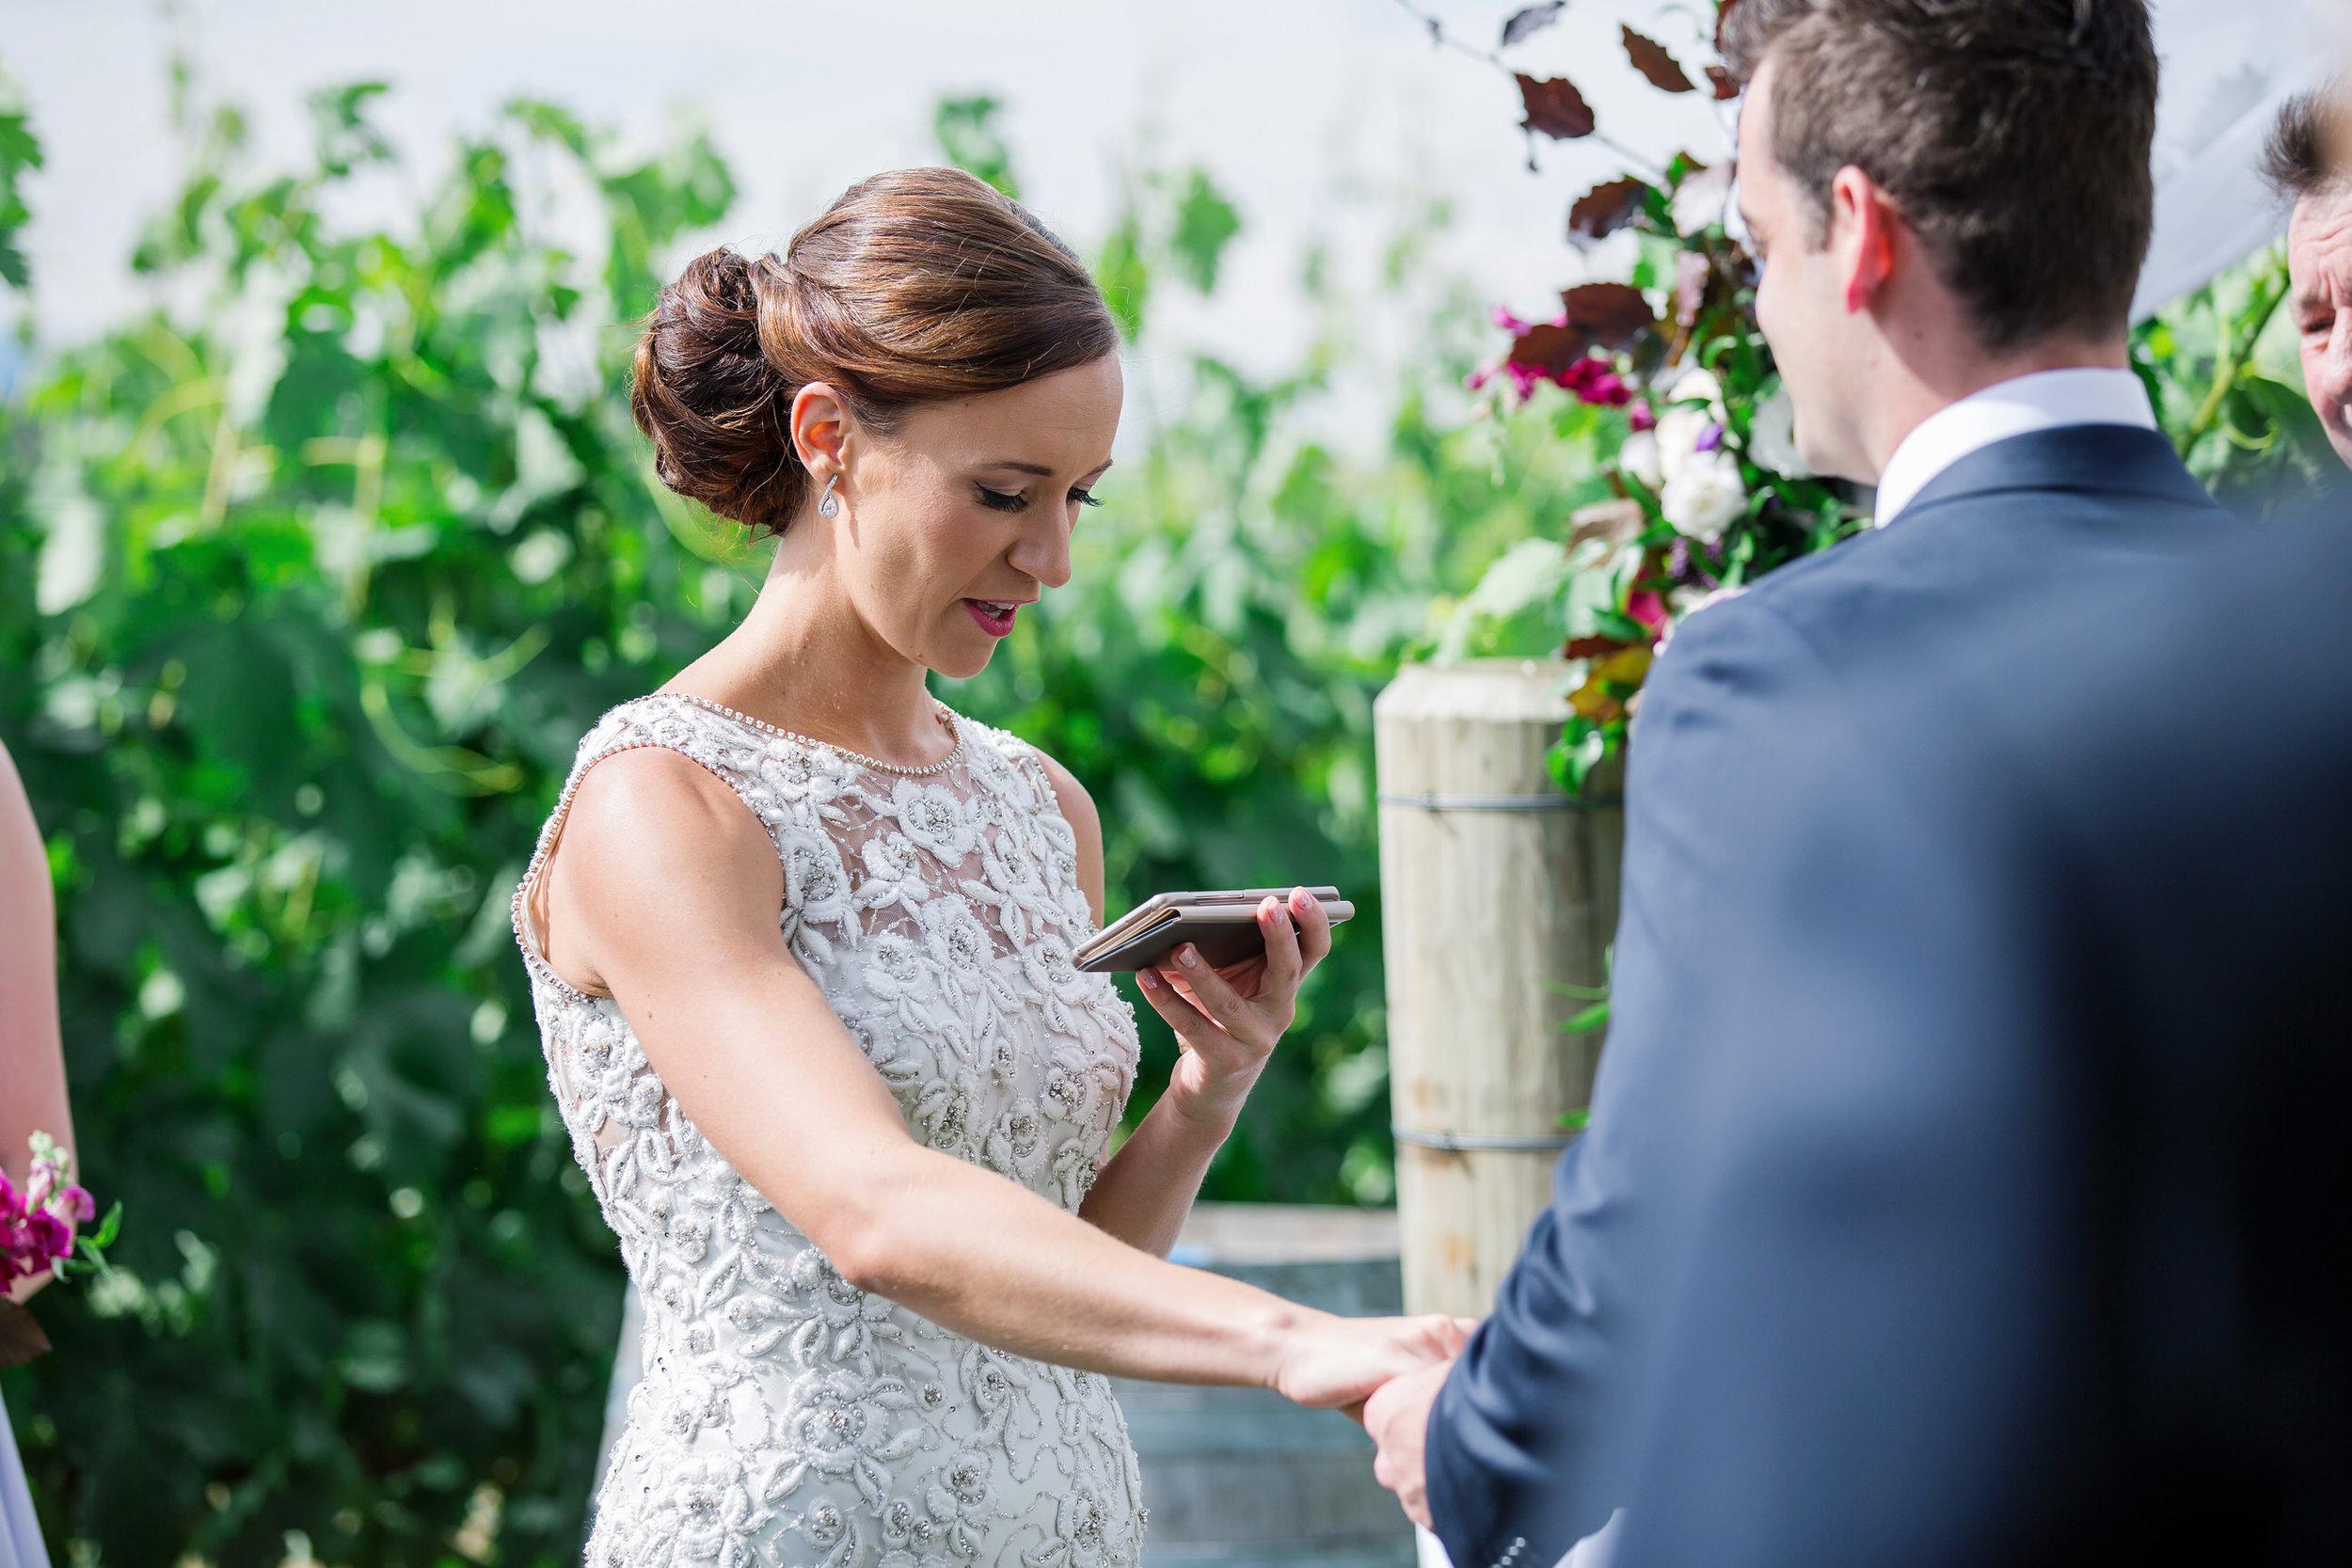 Martinborough-Poppies-Wedding-Caine-Eloise-Toni-Larsen-0081.jpg